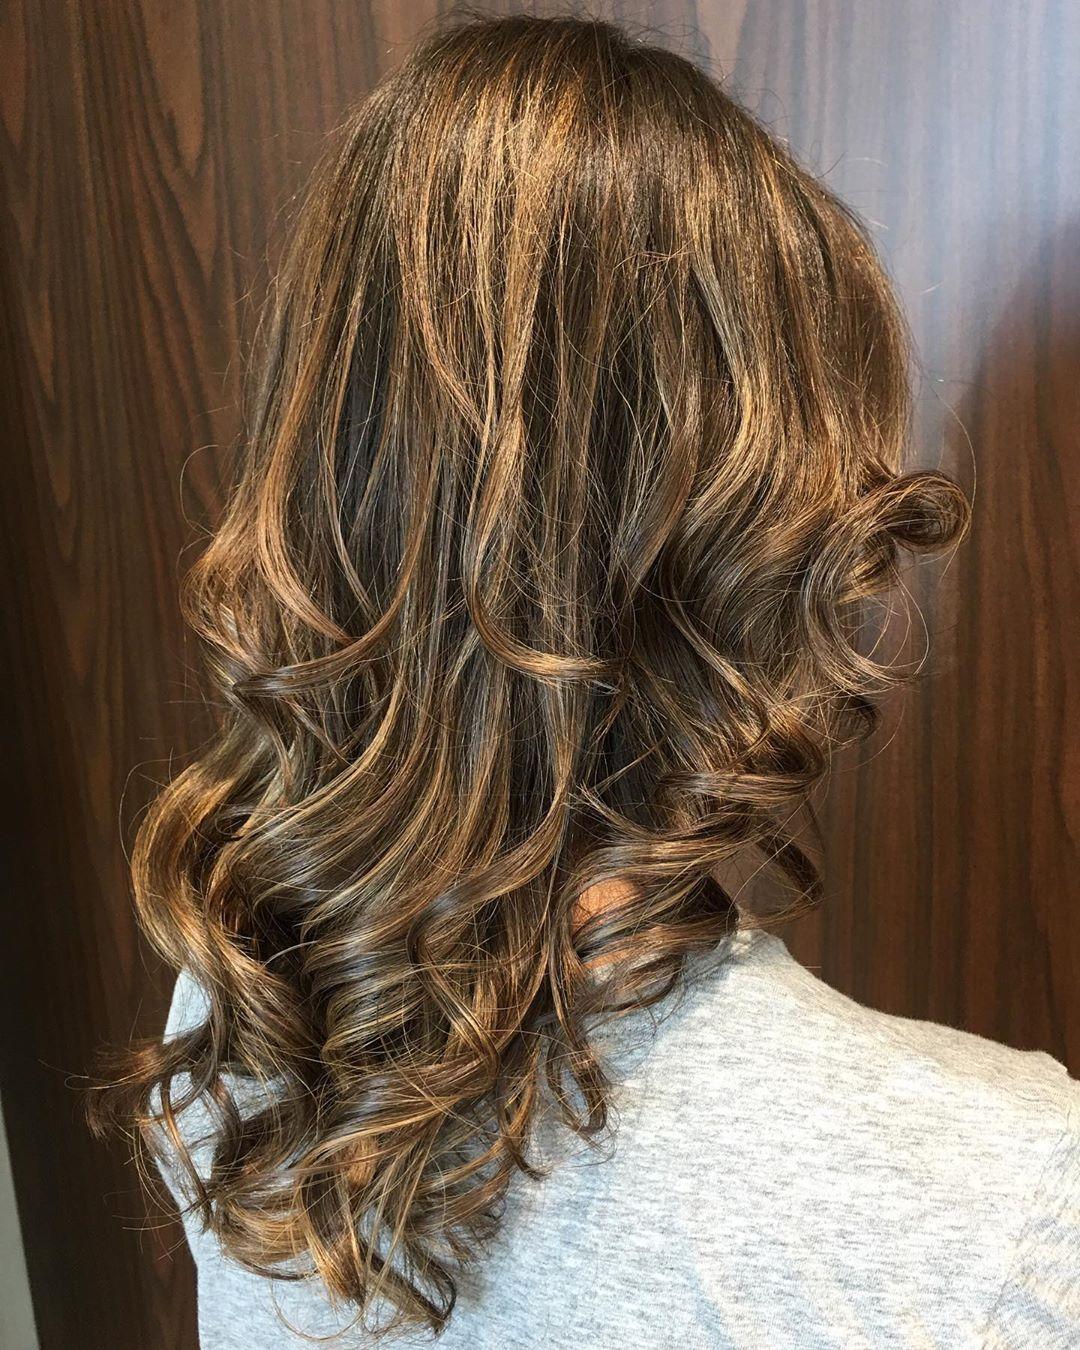 Hello Fall Hair By Itty Hair Haircolor Haircut Hairstyles Colorcorrection Schwarzkopf Schwarzkopfprofession In 2020 Loreal Hair Fall Hair Hair Styles